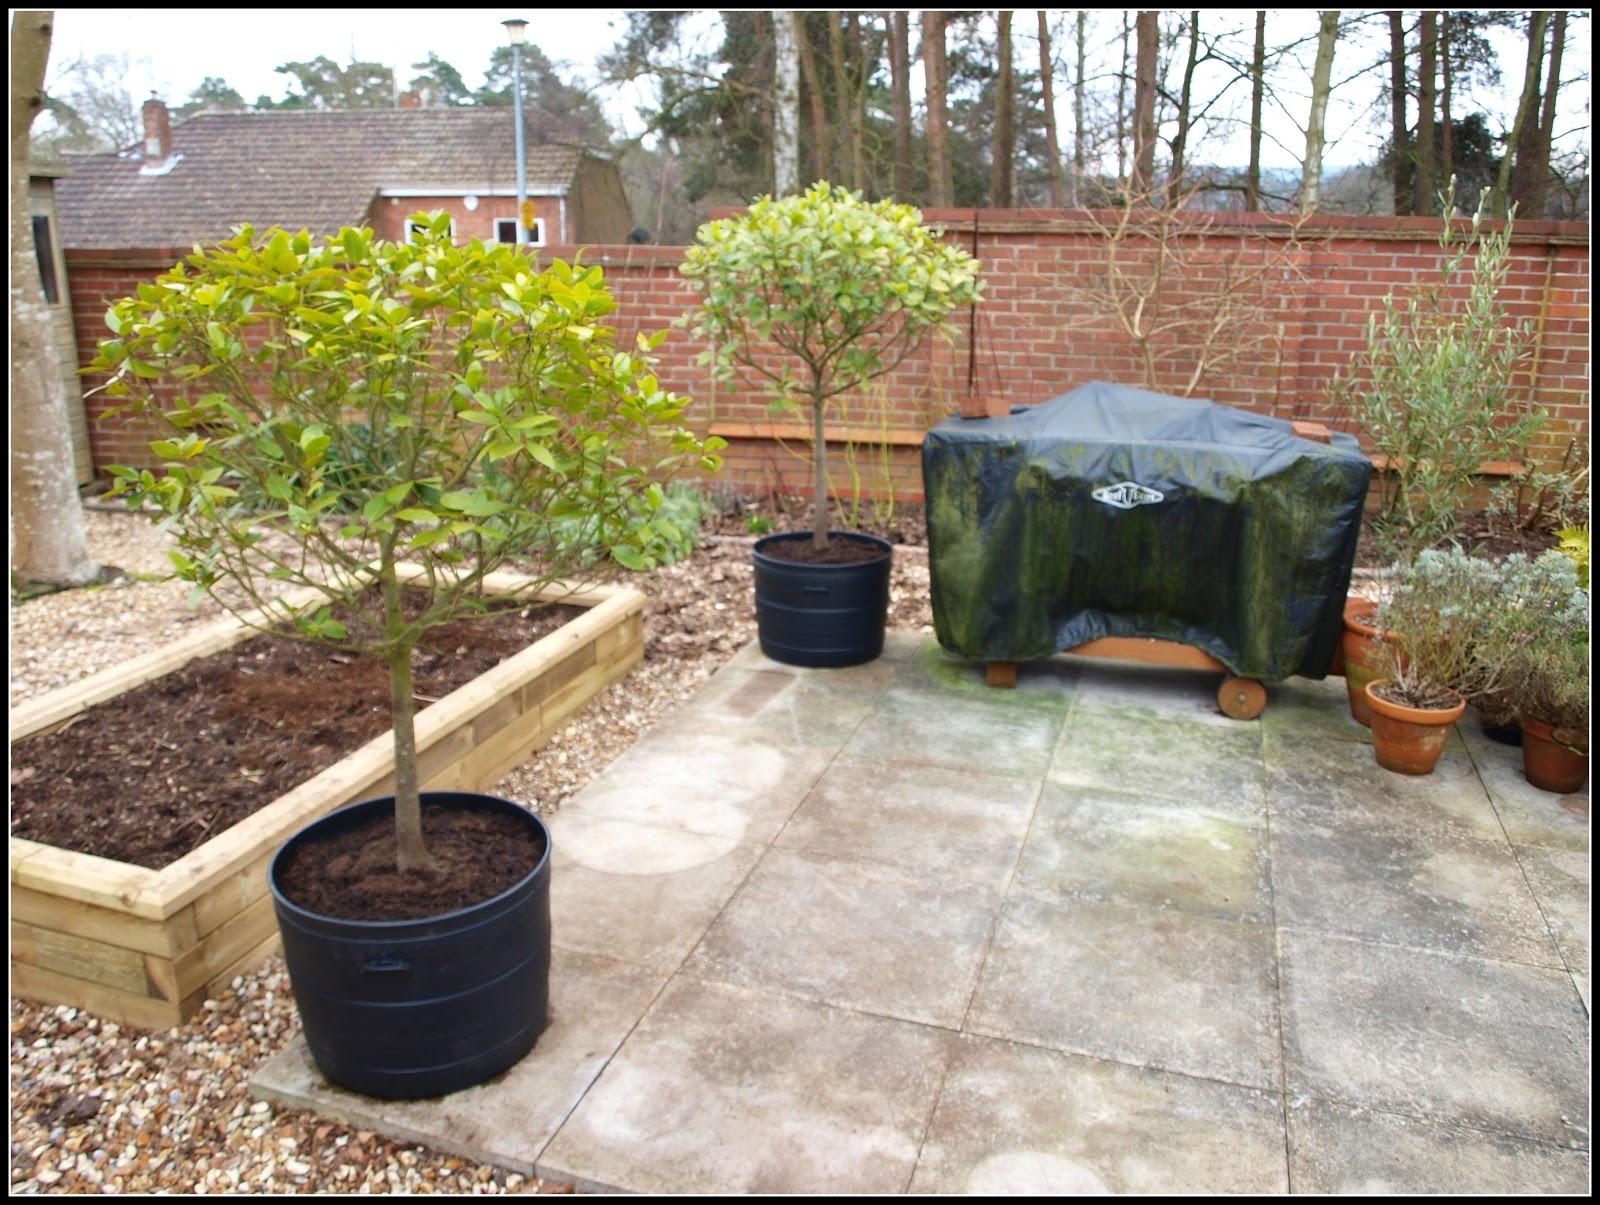 mark u0027s veg plot re potted bay trees a success story